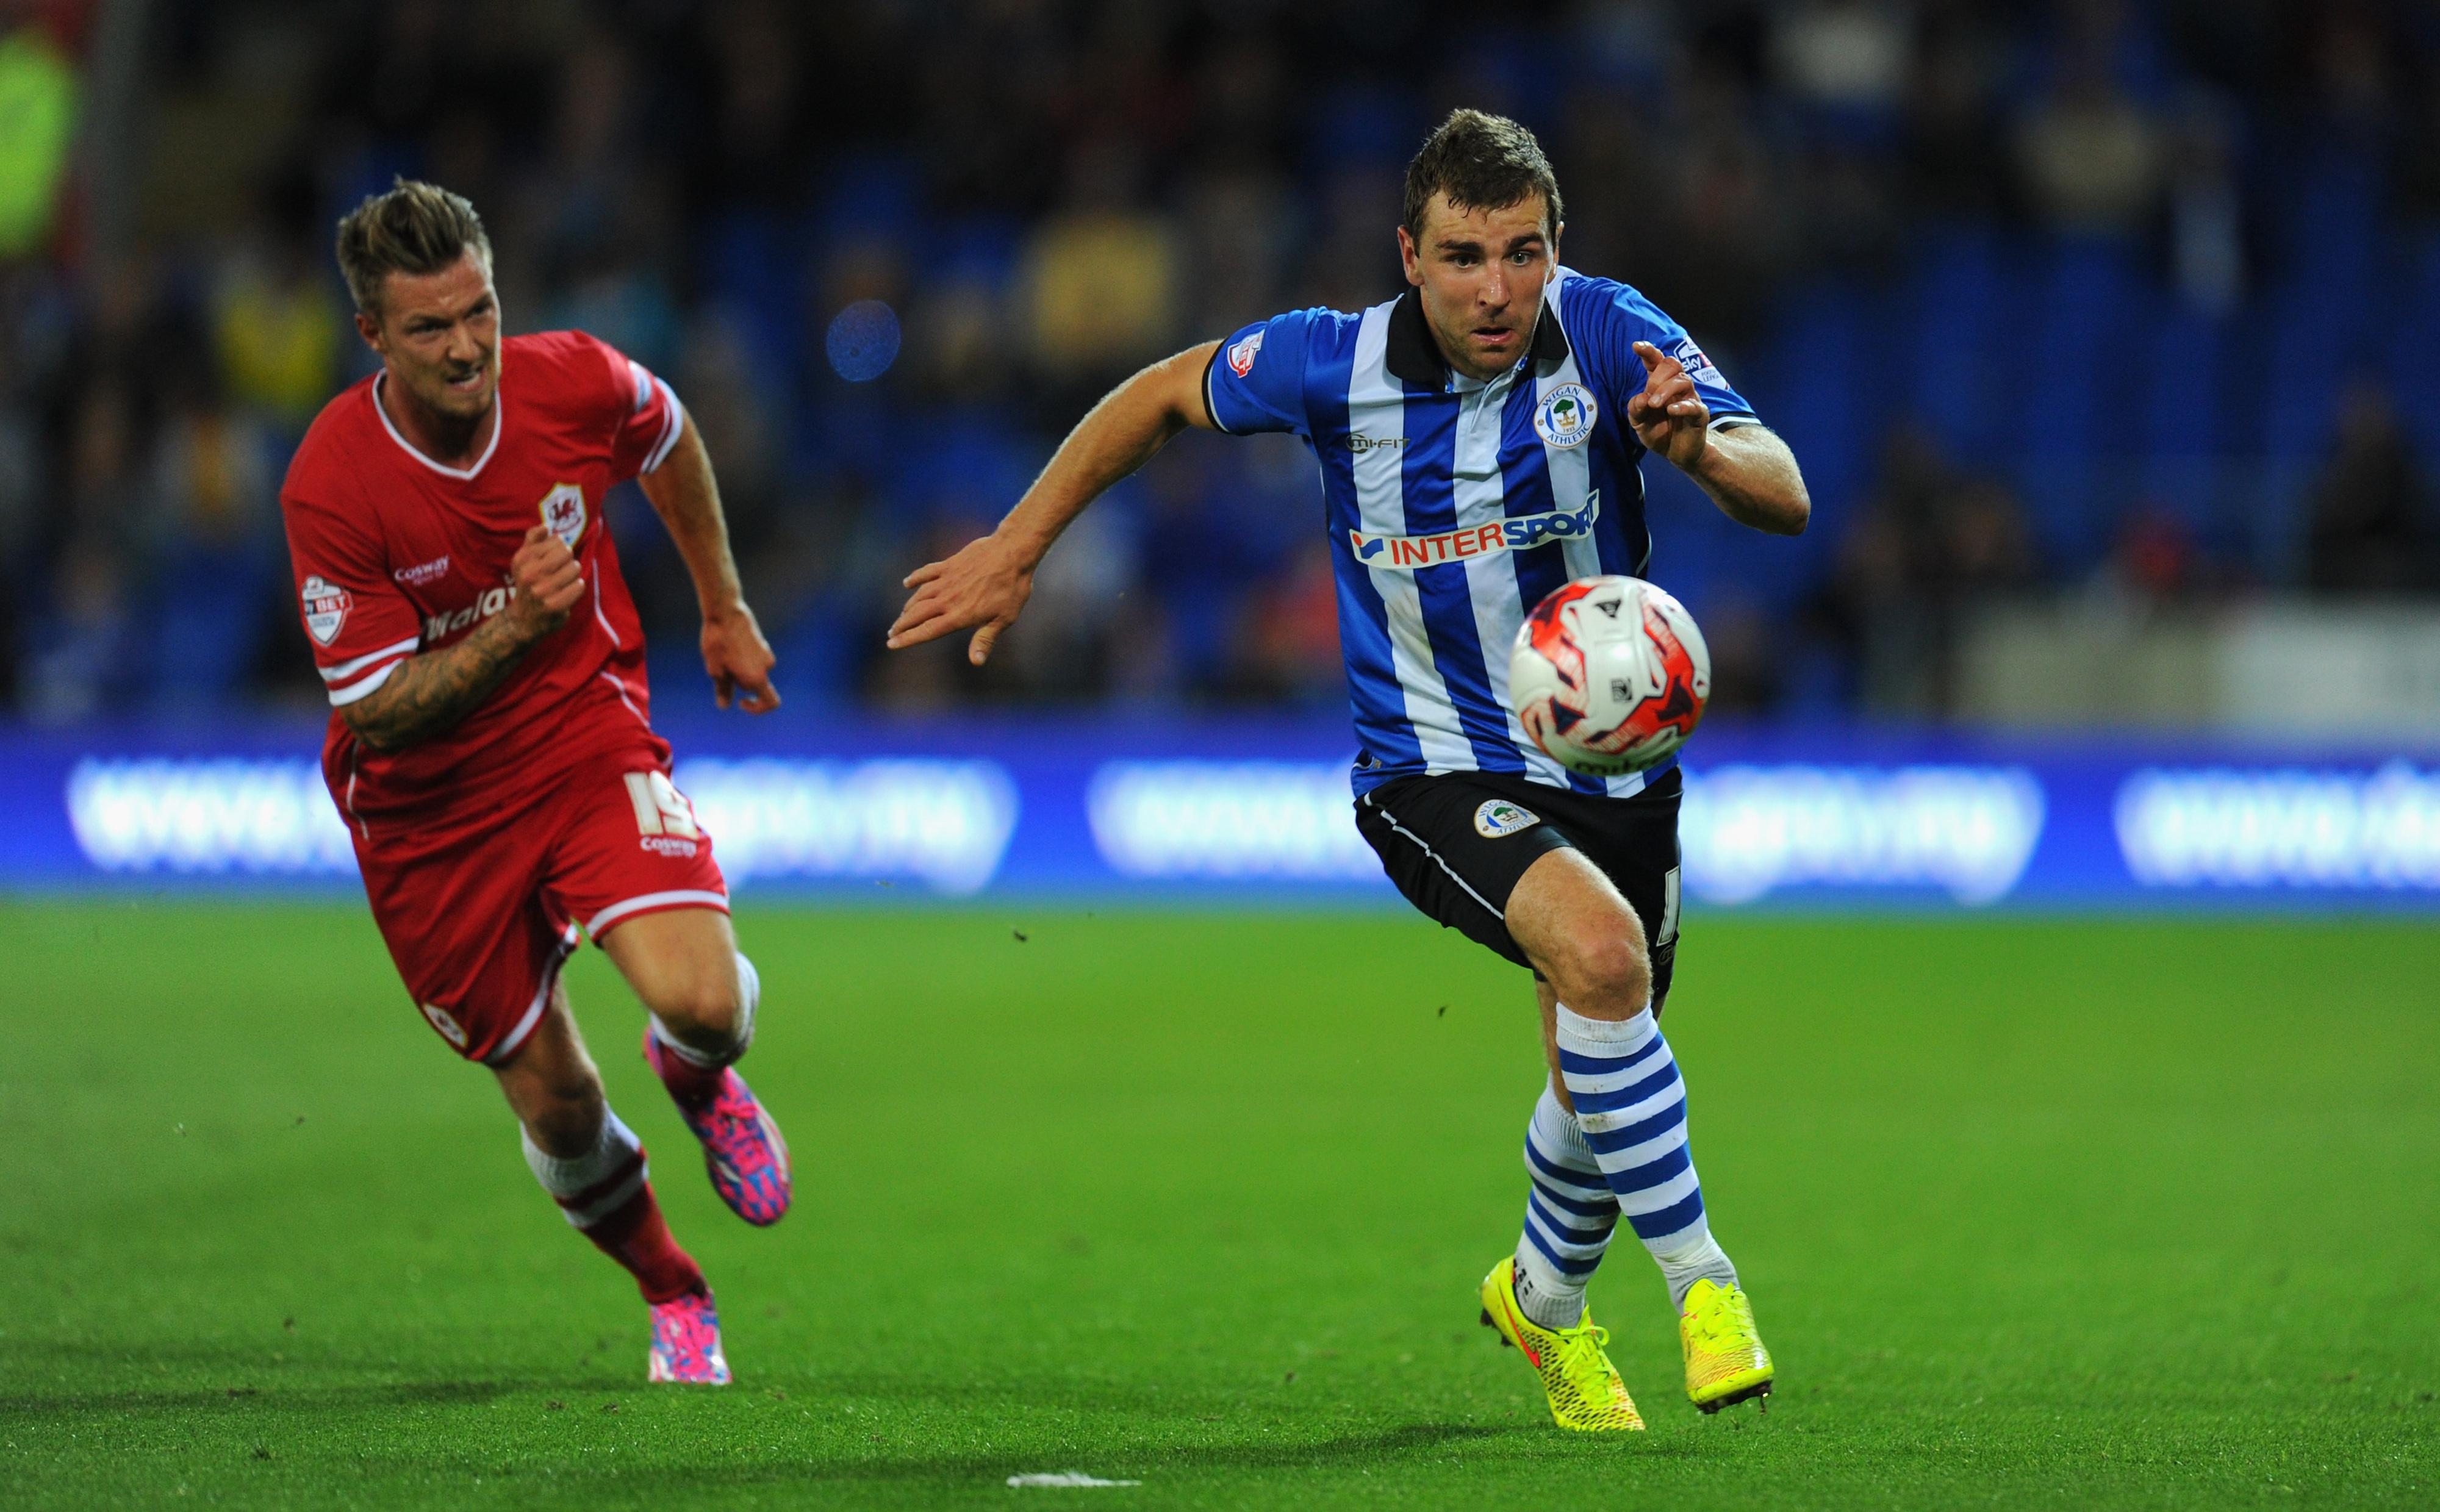 James shone in his last Wigan game.